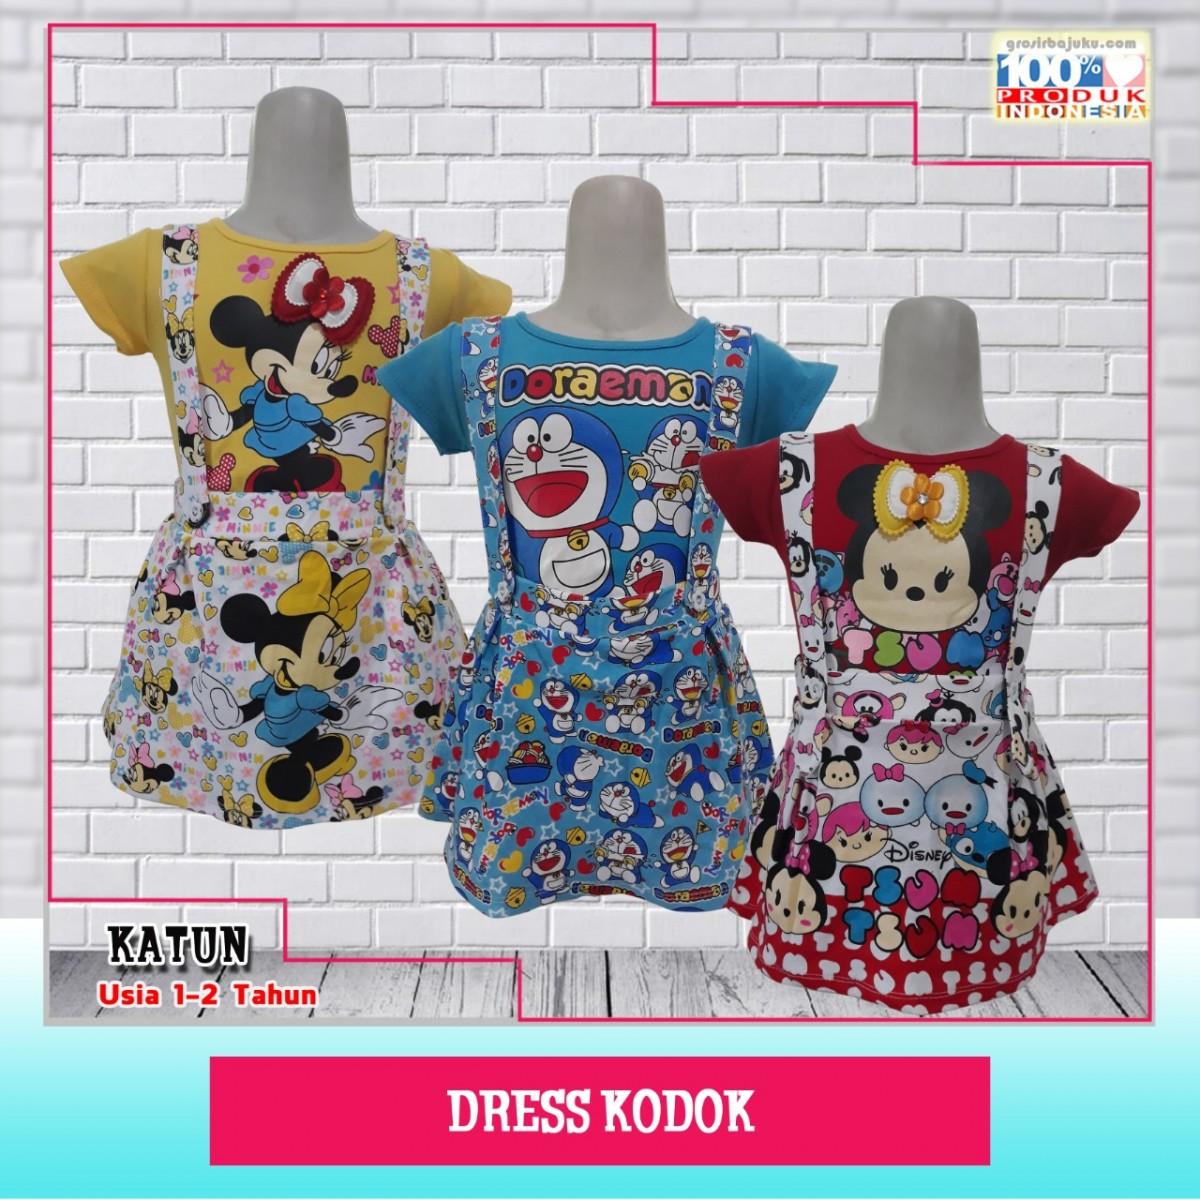 ObralanBaju.com Dress Kodok